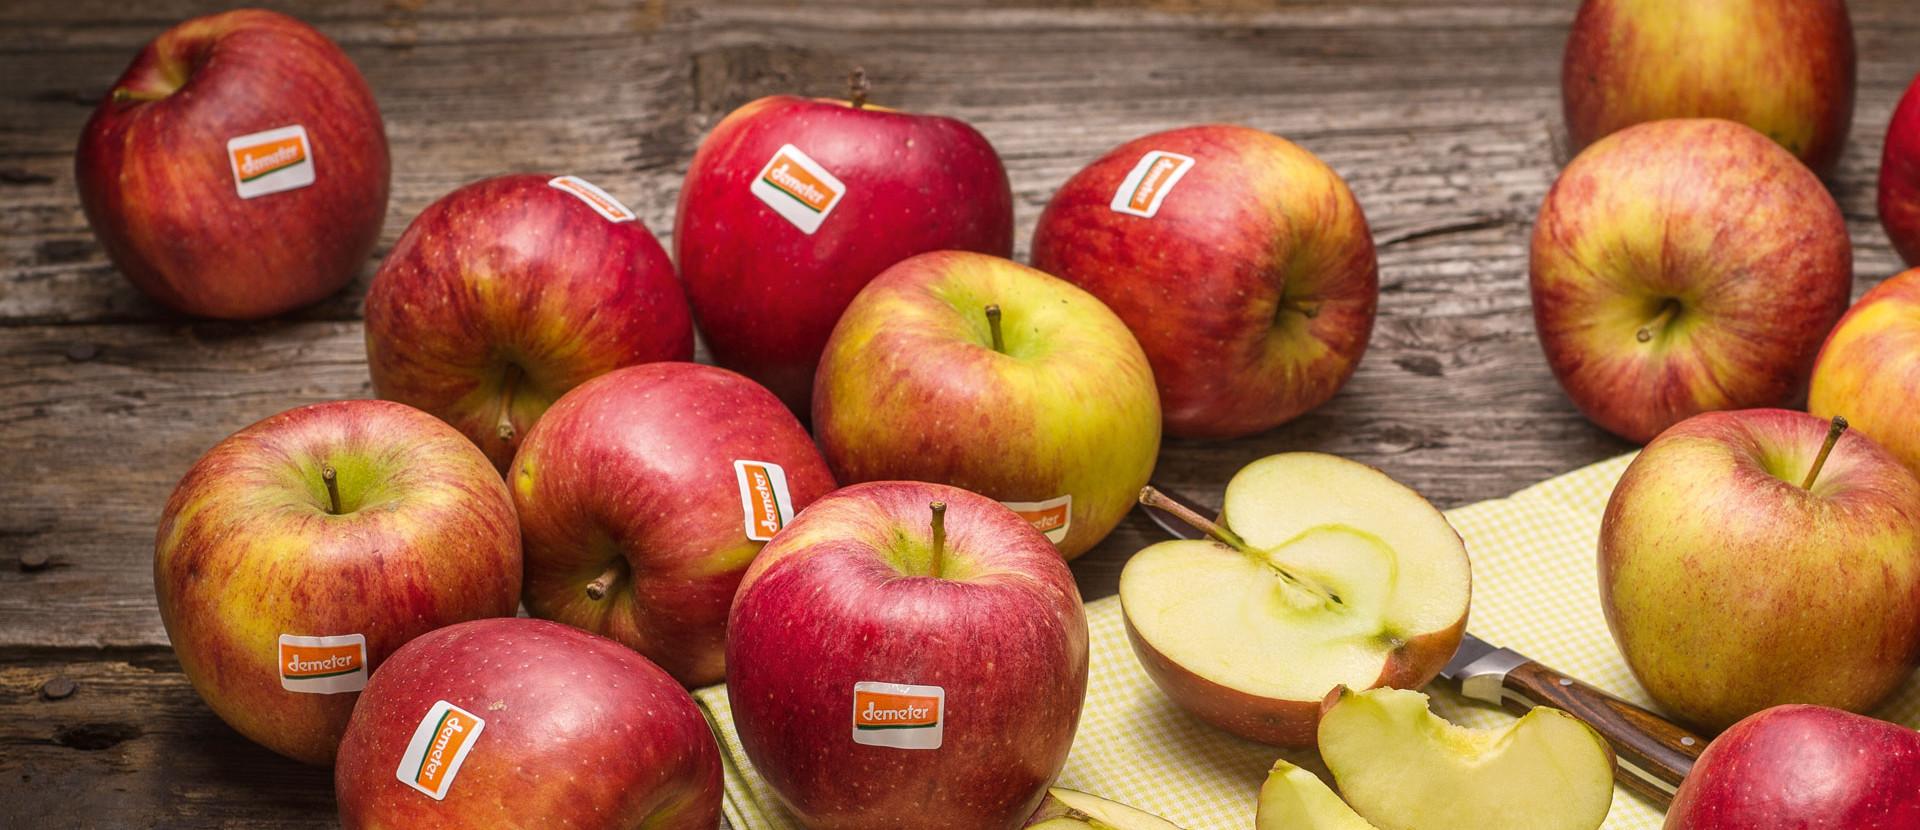 rote demeter Äpfel